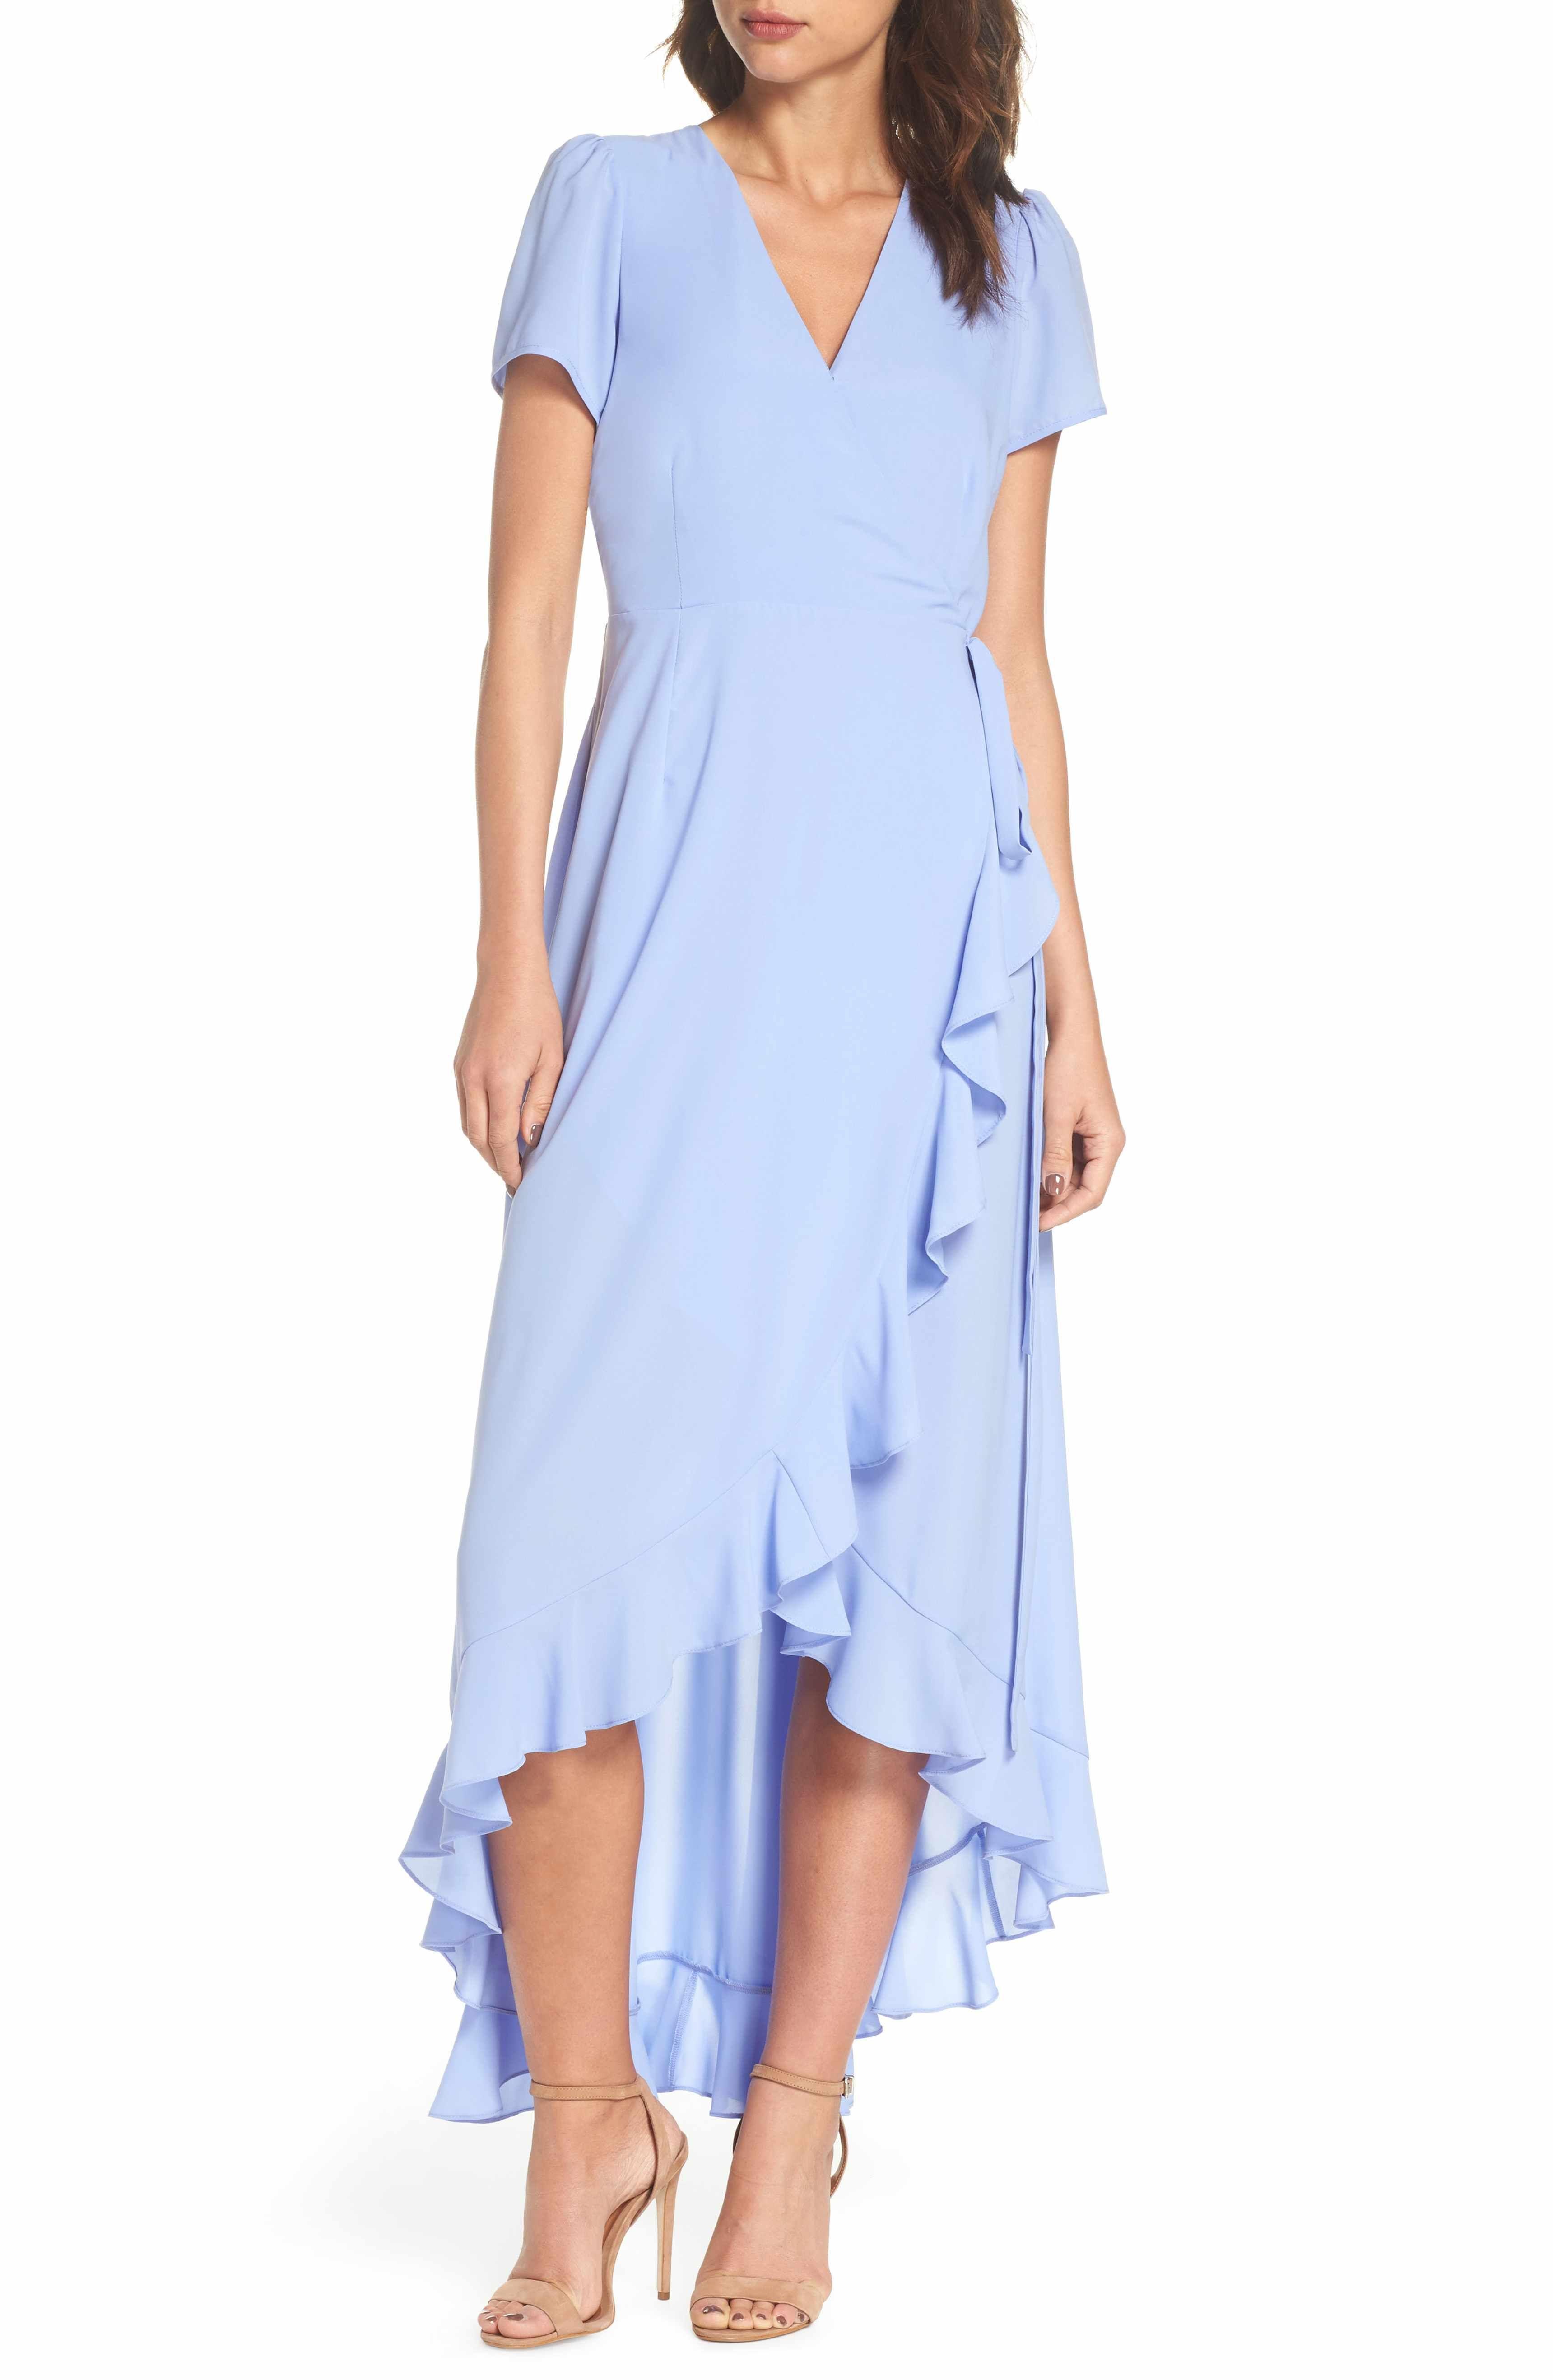 Felicity Coco Madge Ruffle Wrap Maxi Dress Regular Petite Nordstrom Exclusive Nordstrom Wrap Dress Styles Petite Wrap Dress Dresses [ 5272 x 3440 Pixel ]